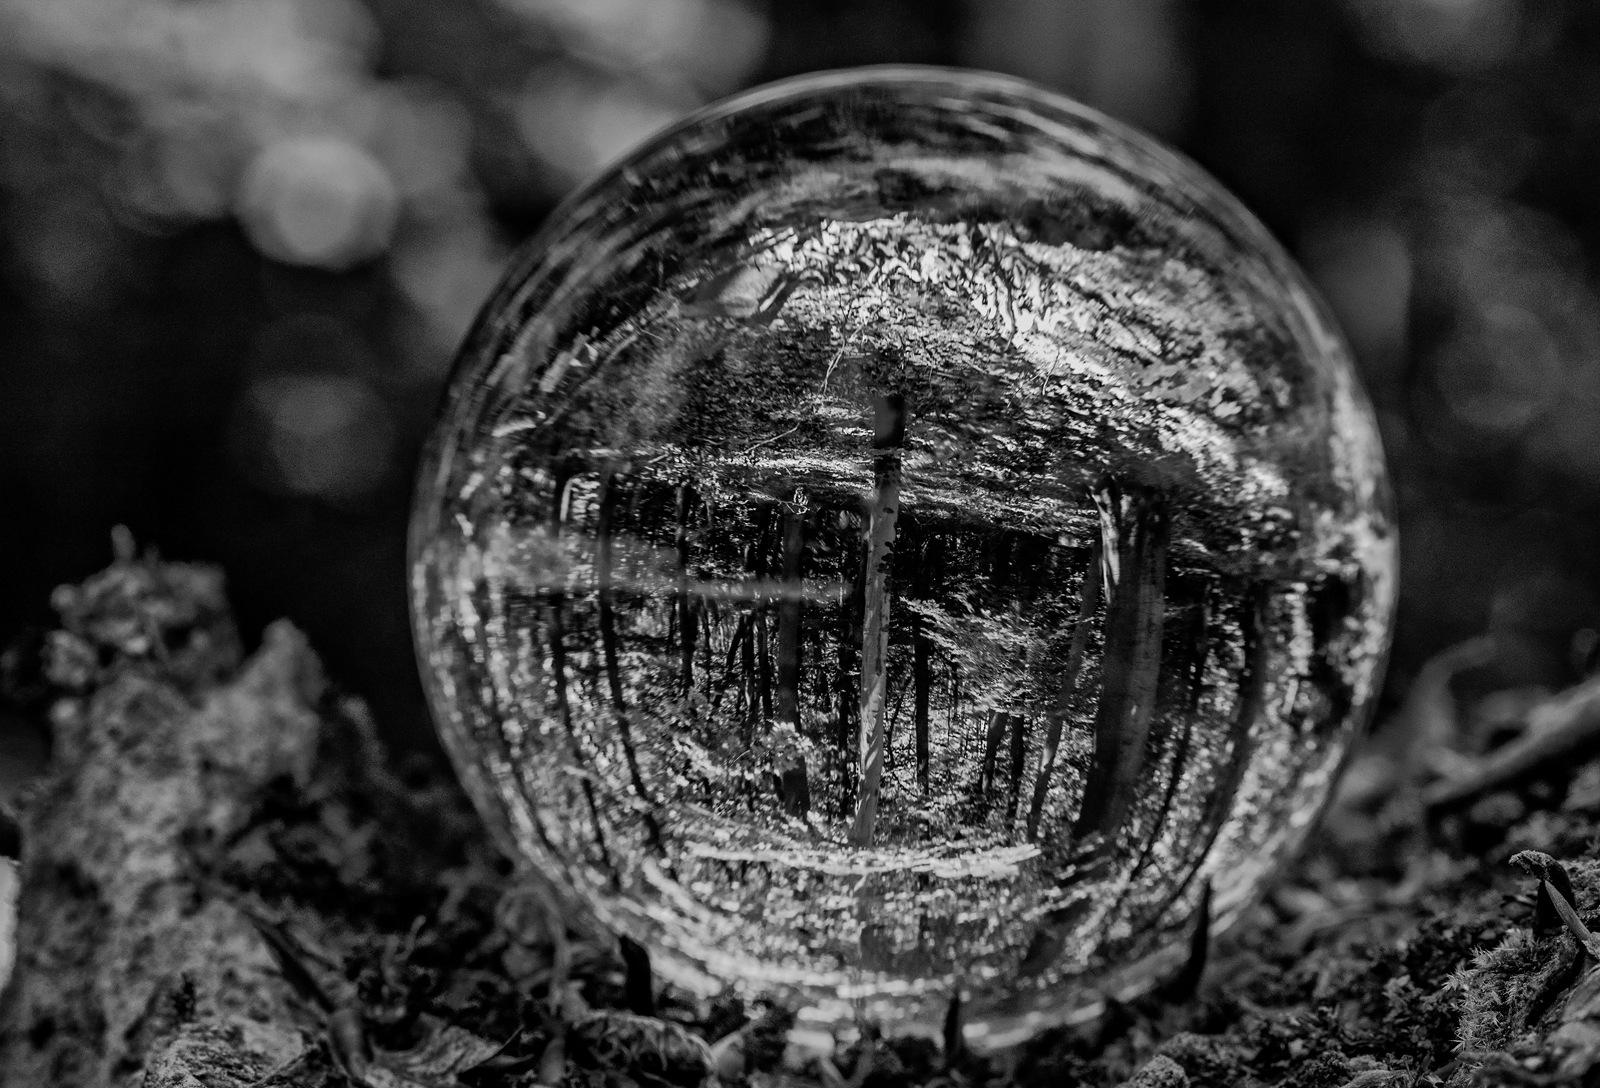 World in a bowl by karlvock